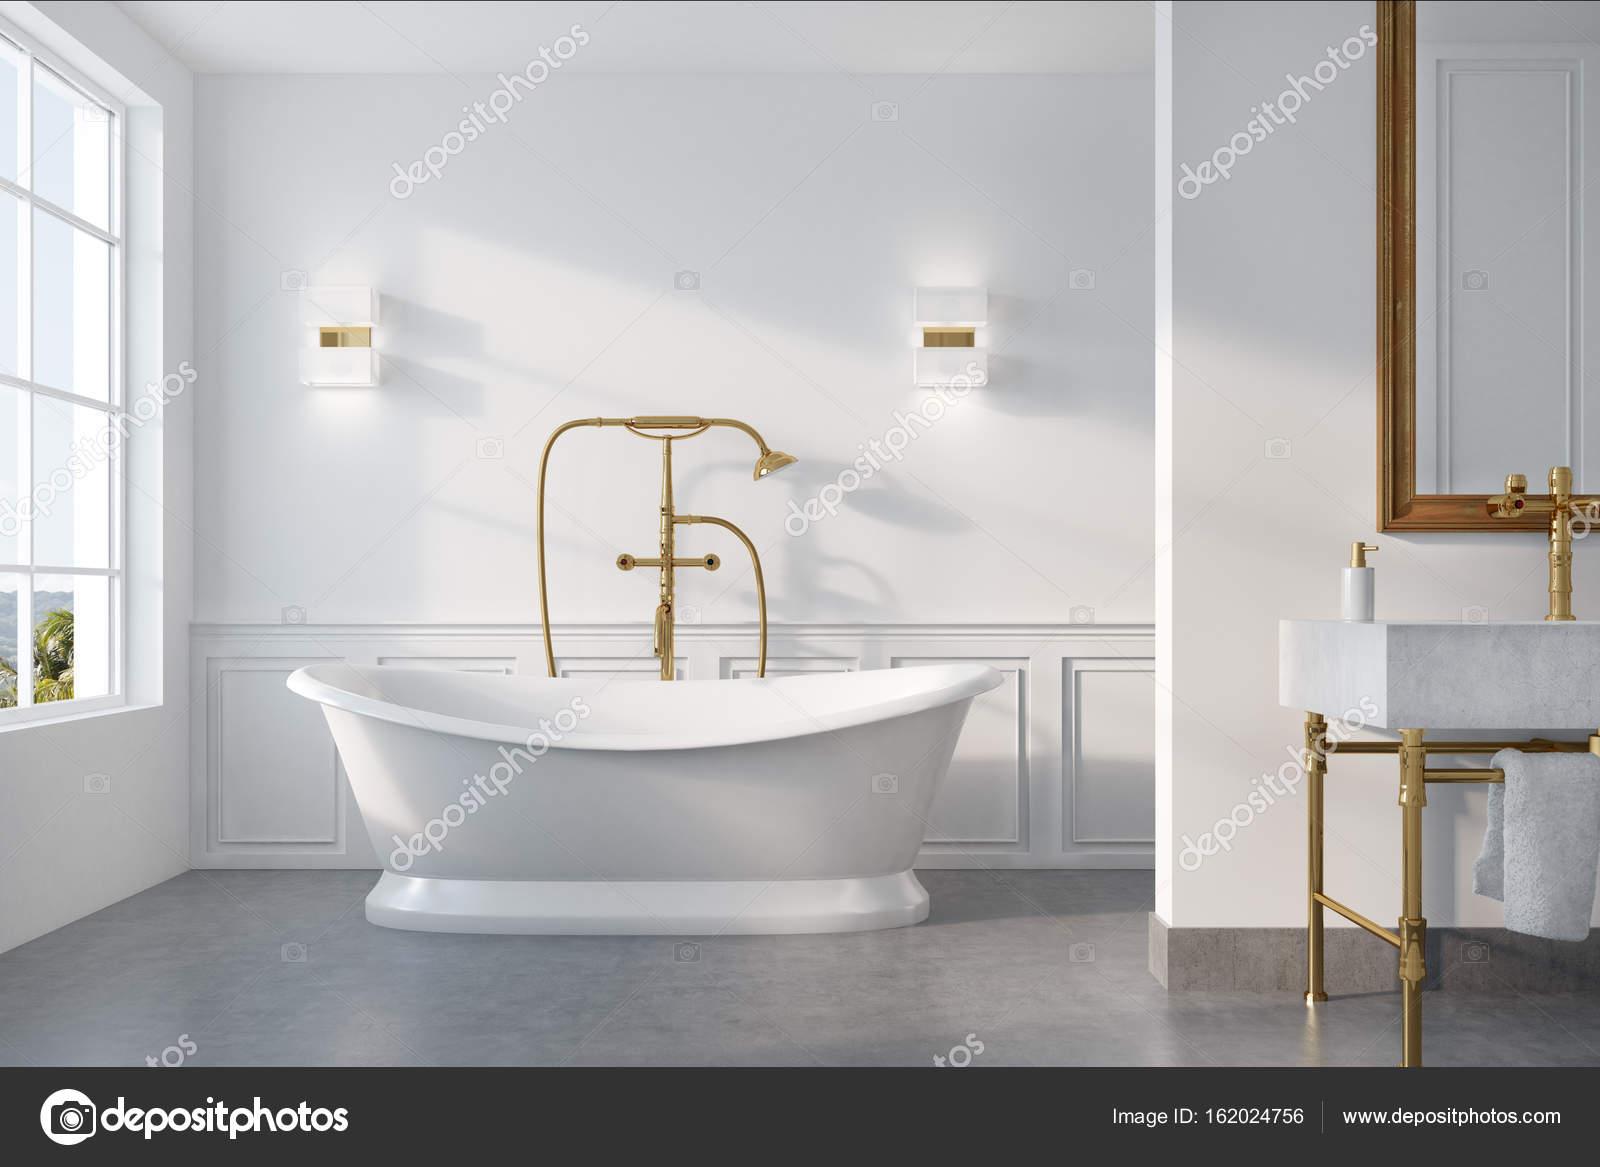 Vasca da bagno d 39 epoca interni bianco foto stock denisismagilov 162024756 - Vasca da bagno immagini ...